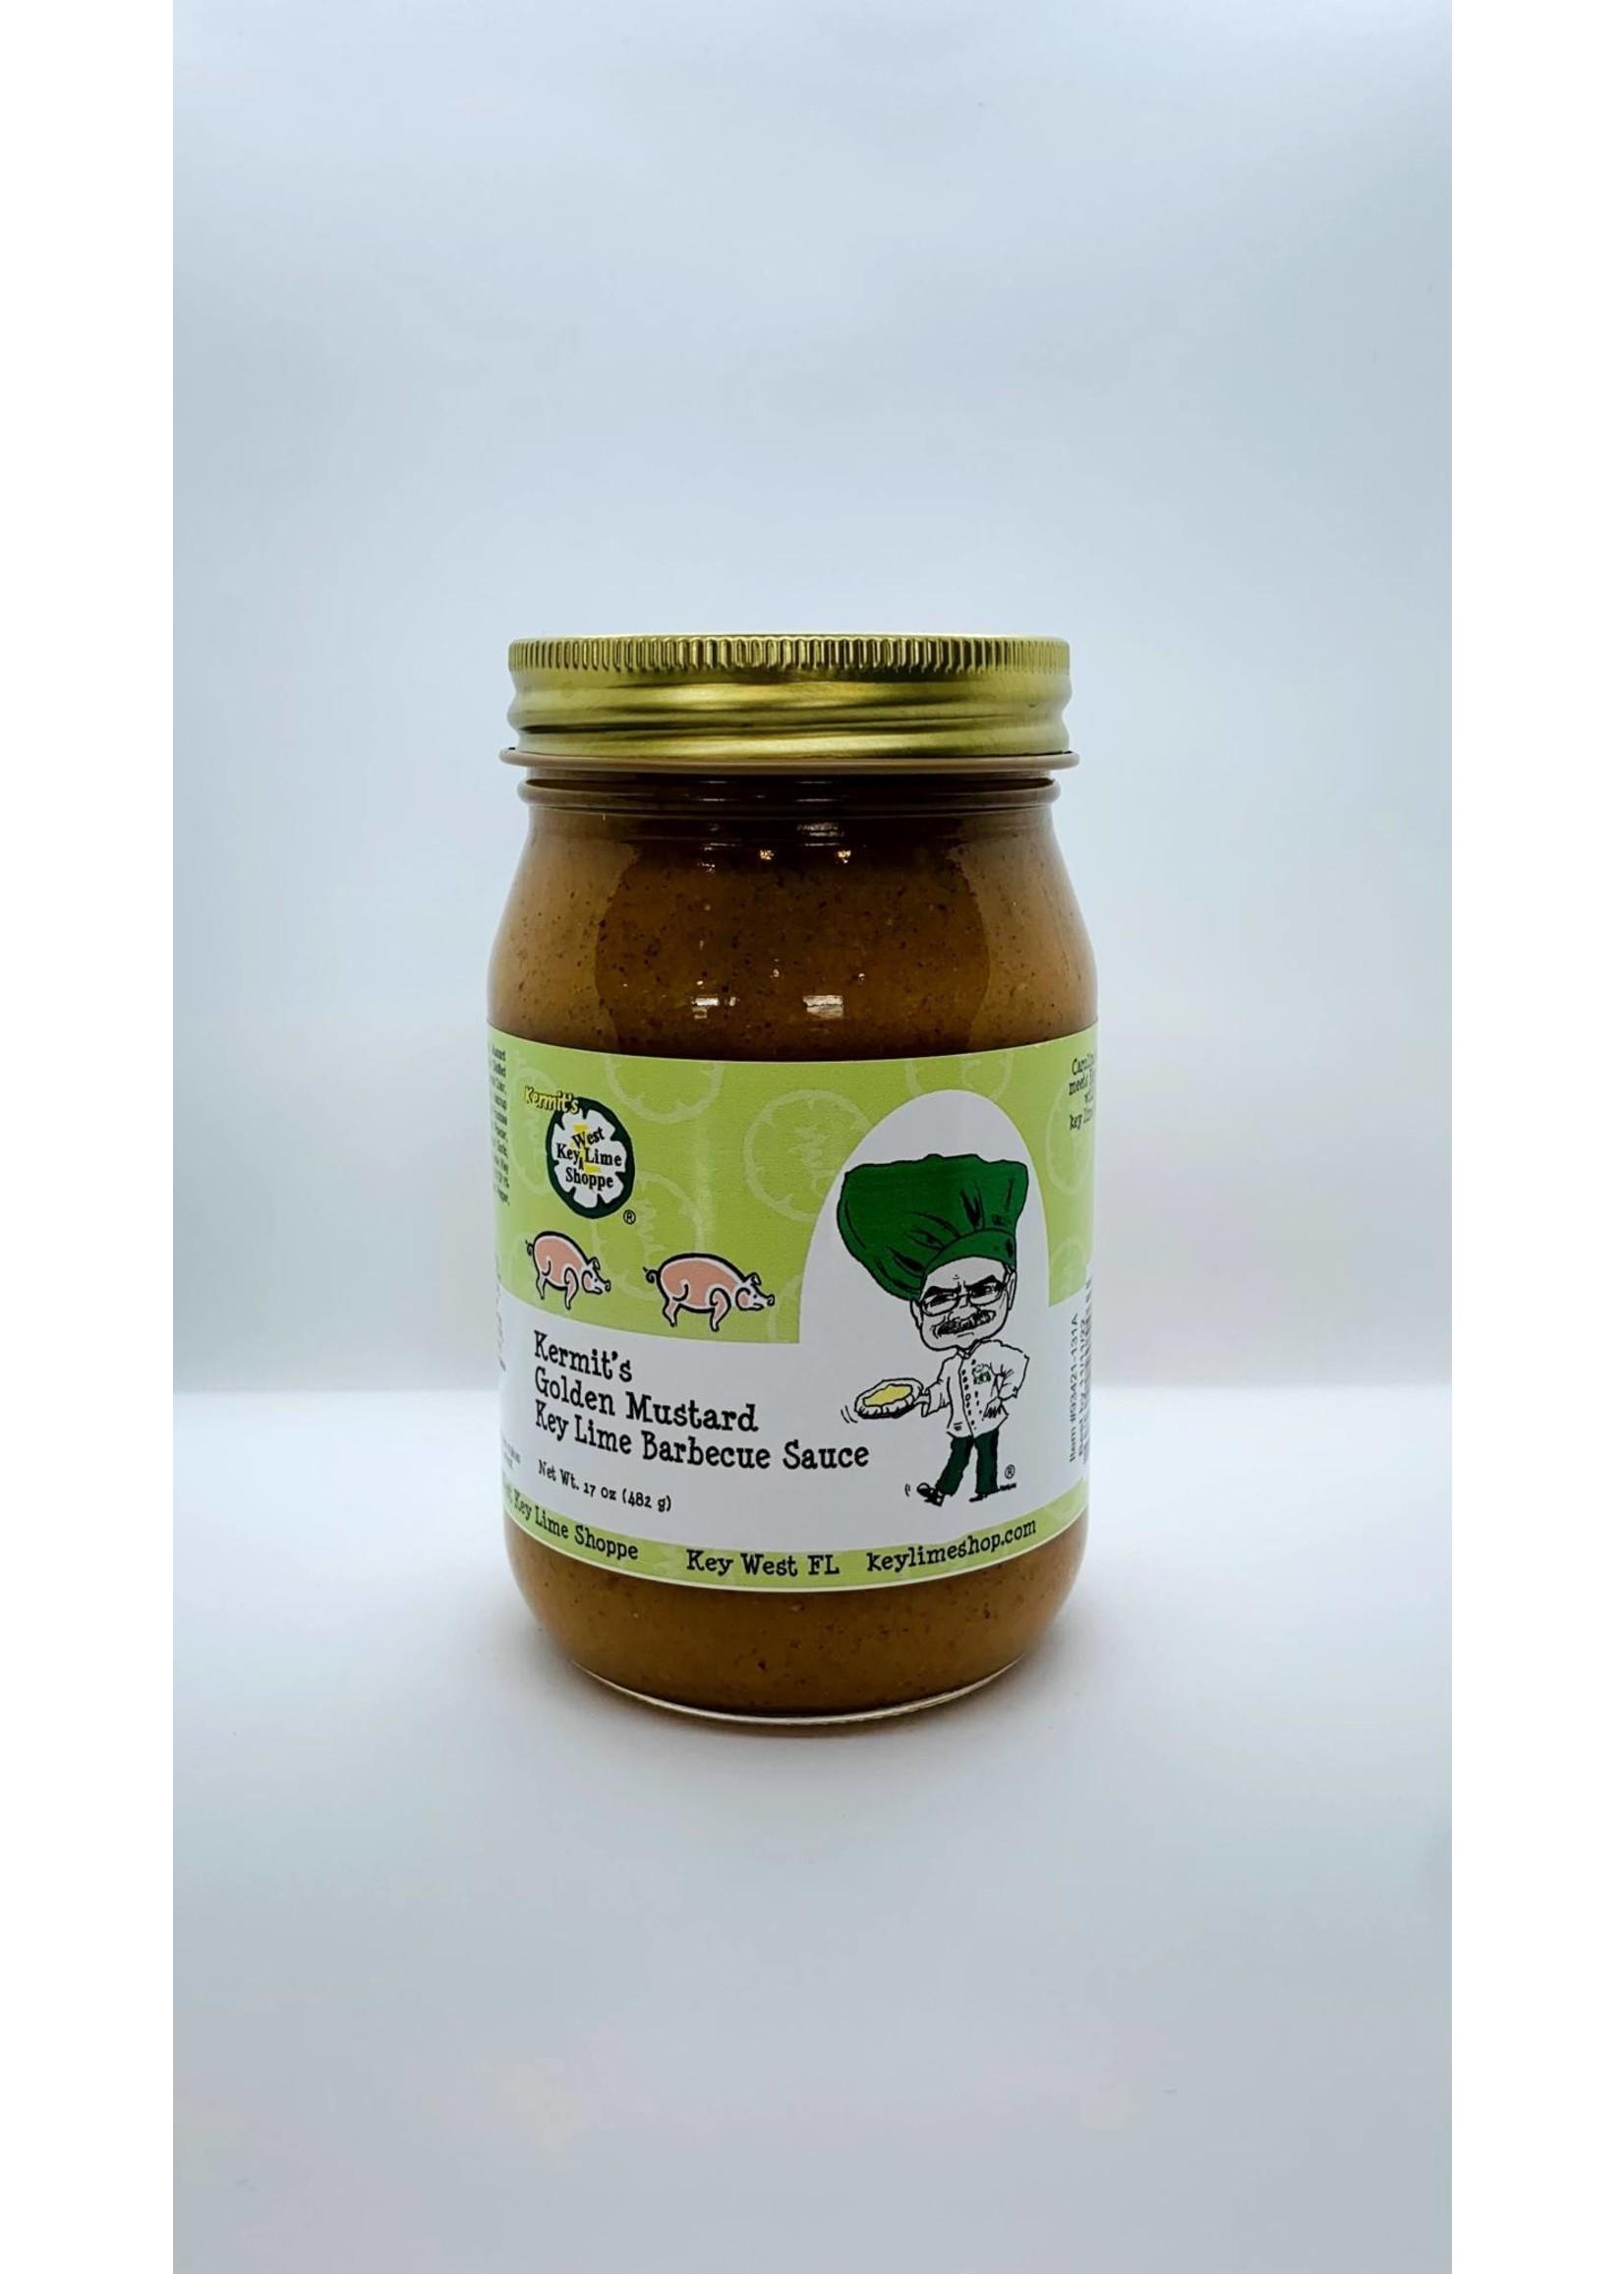 Kermit's Golden Mustard Key Lime Barbecue Sauce  17 oz.